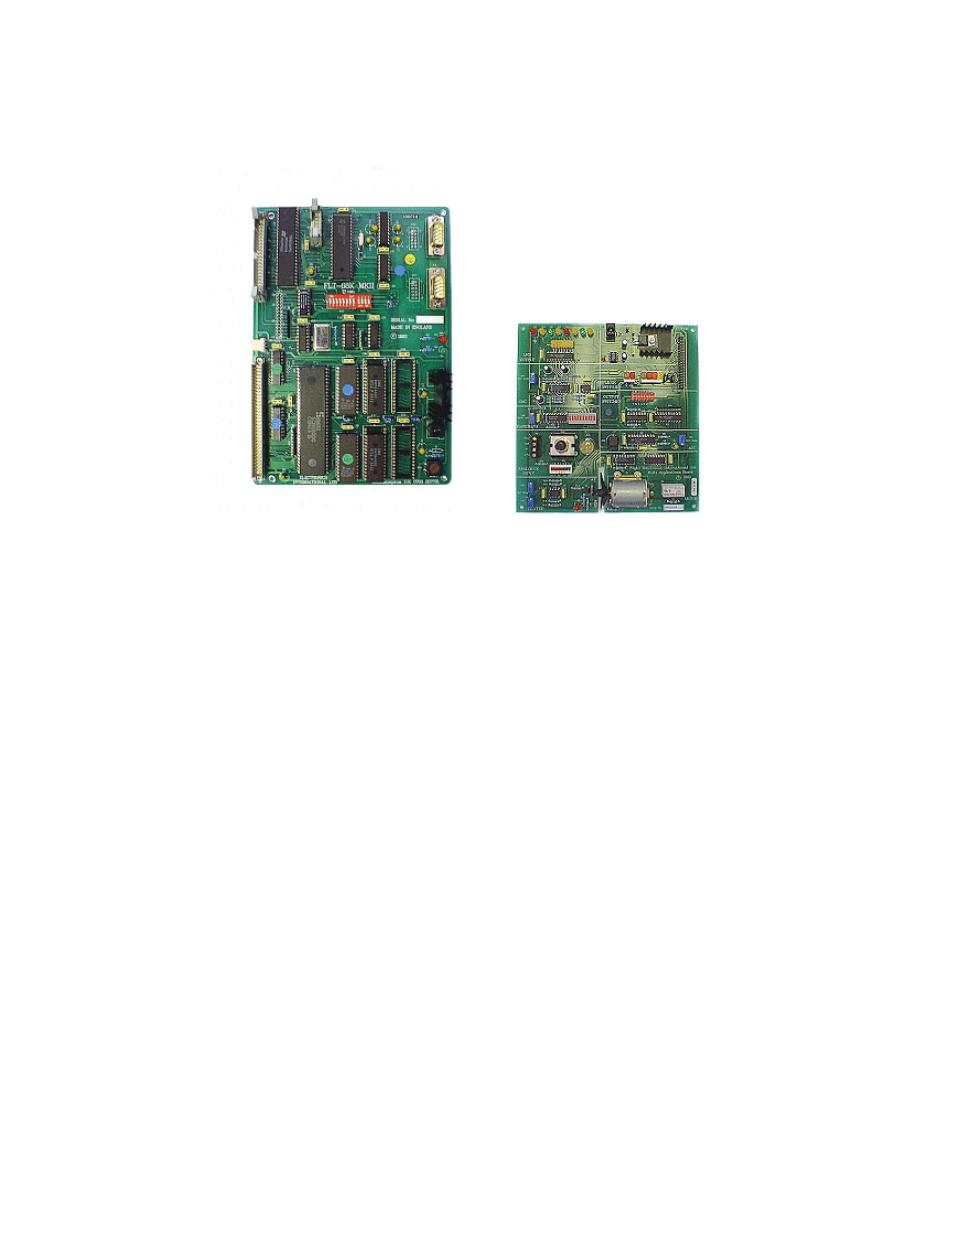 Motorola Mc68000 User Manual